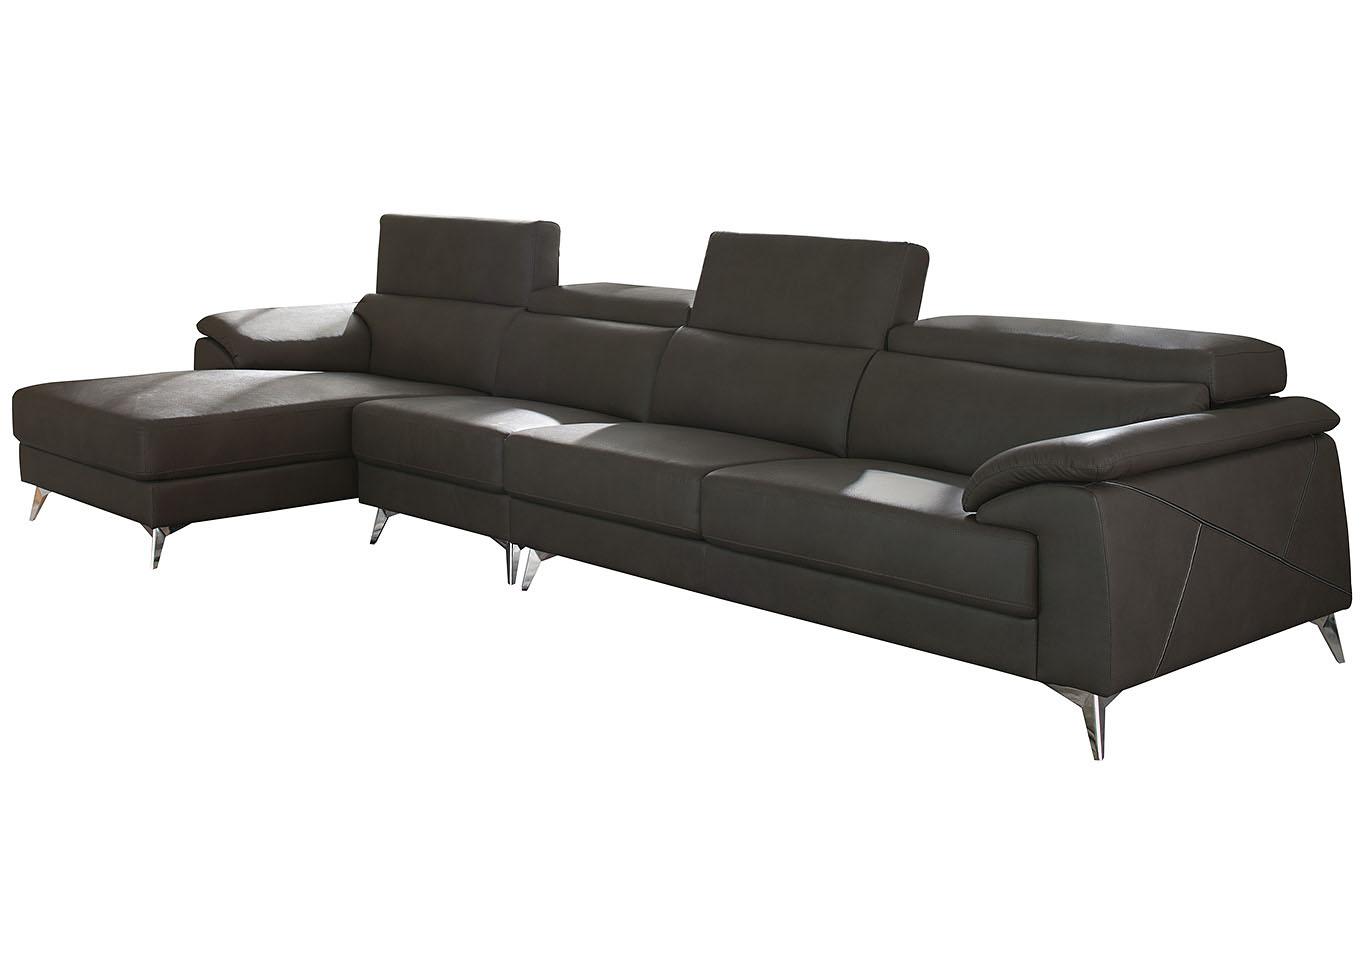 Utah Furniture Direct - Ogden, Utah Tindell Gray Extended Right ...